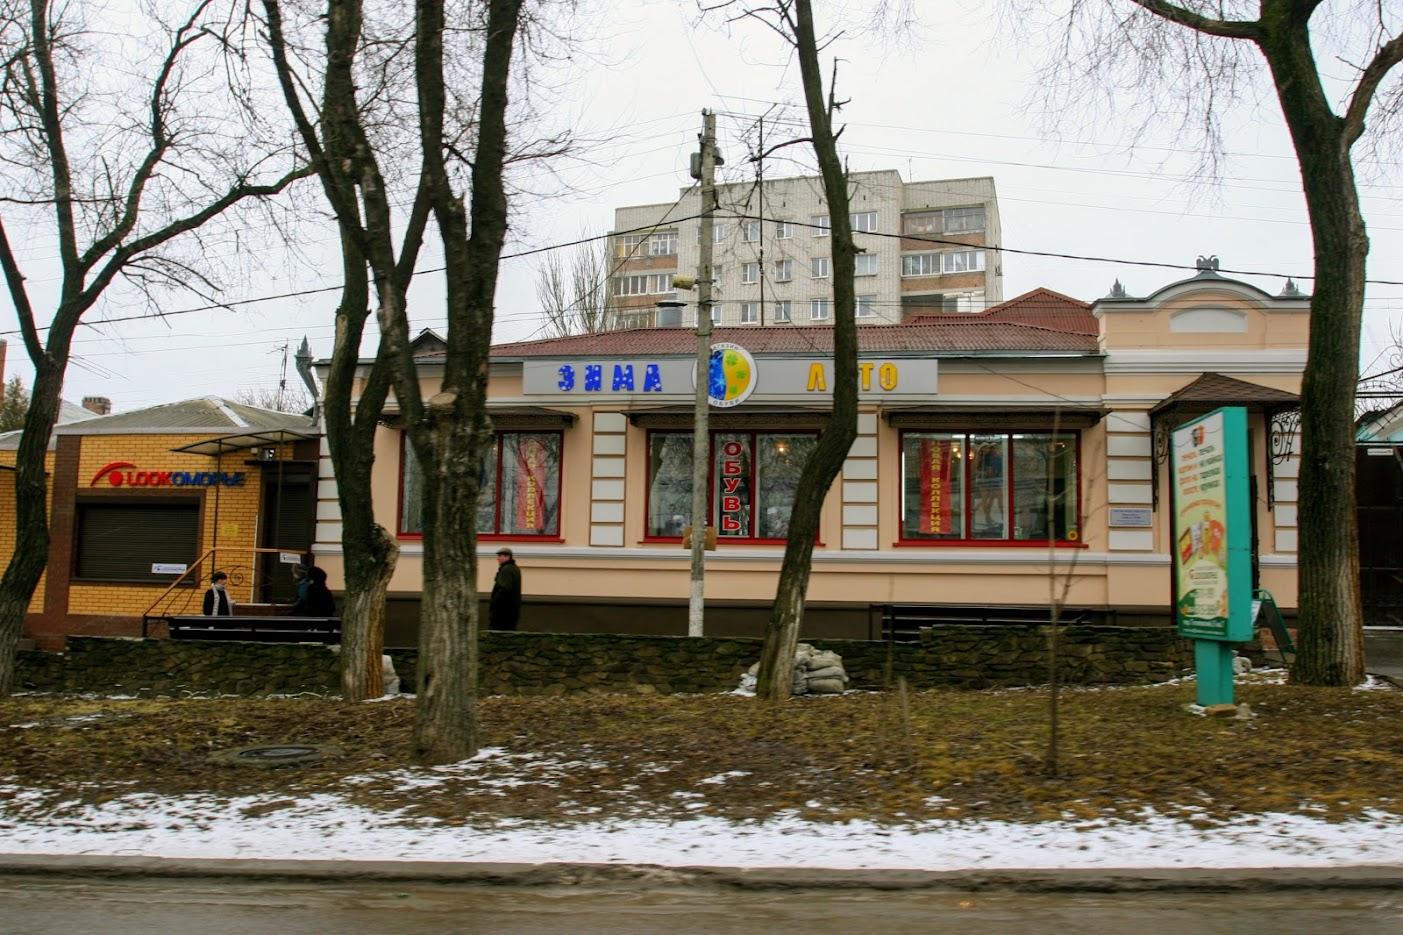 https://sites.google.com/site/istoriceskijtaganrog/gogolevskij-pereulok/dom-15